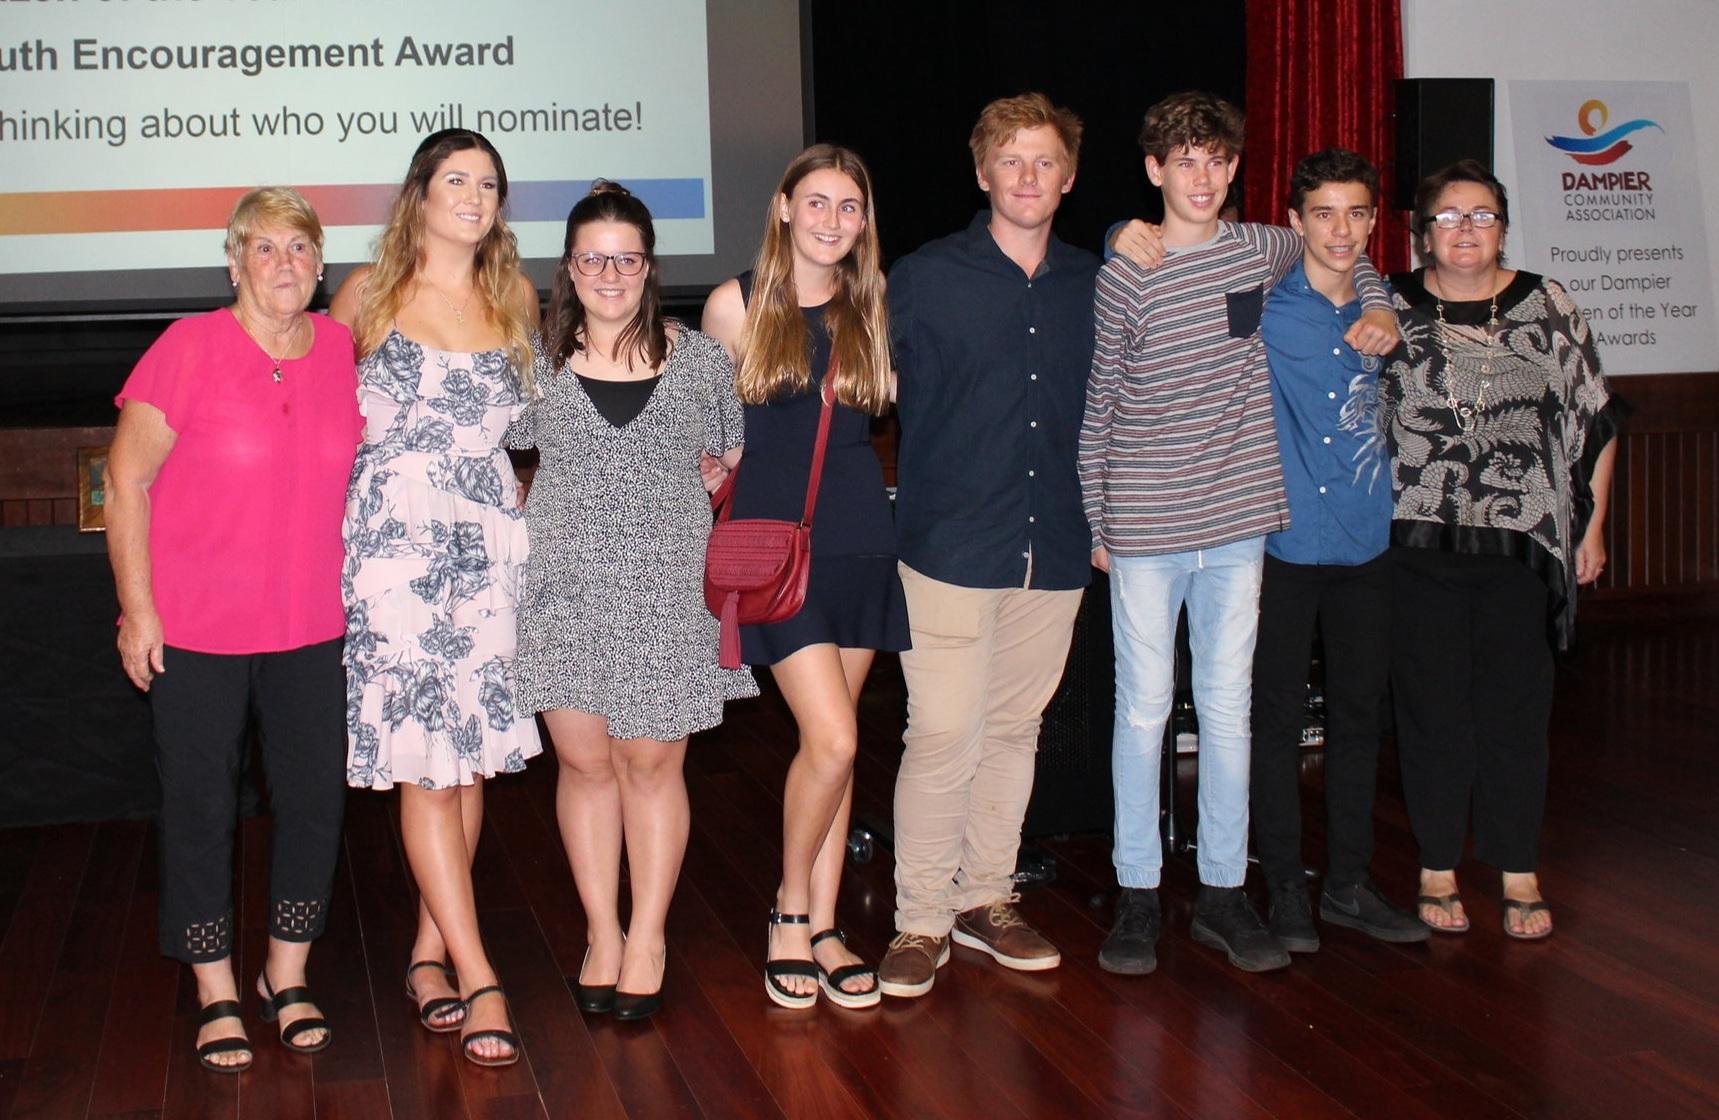 Harry Chilvers Youth Encouragement Award nominees  Jean Chilvers, Angel Beeton, Kyla McLuckie, Astyn Wigley, Jimmy O'Brien, Boston Geikie, Sam Howie Gill Furlong (DCA President)